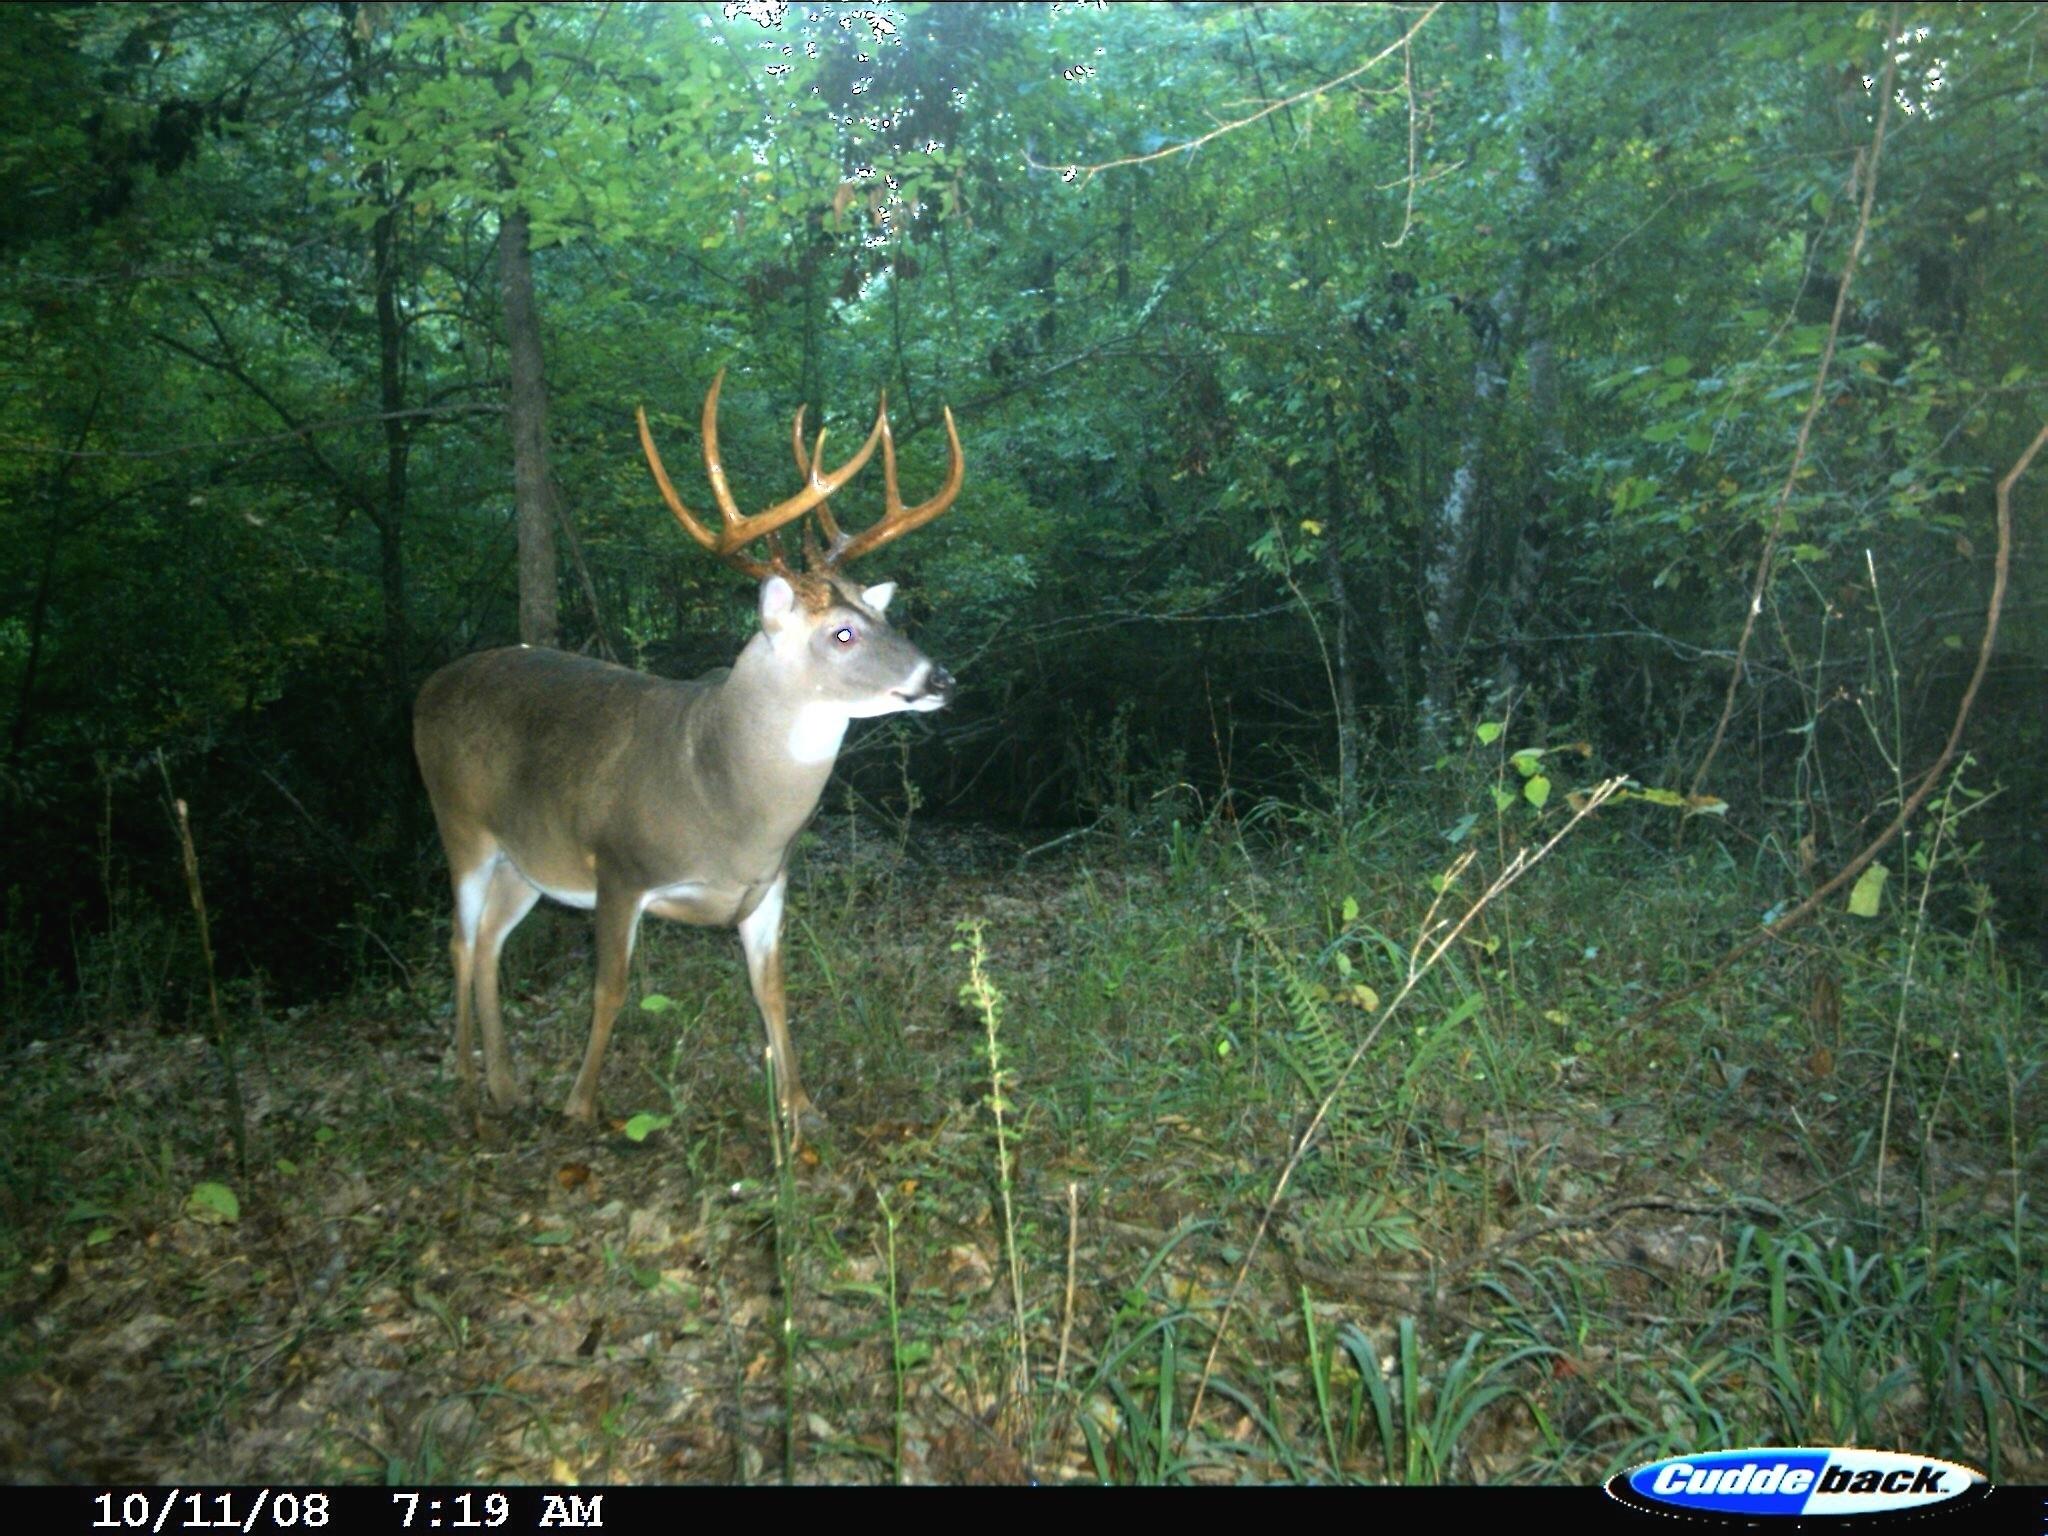 2021 Wny Whitetail Deer Rut | Calendar Template Printable within 2021 Deer Season In Kentucky